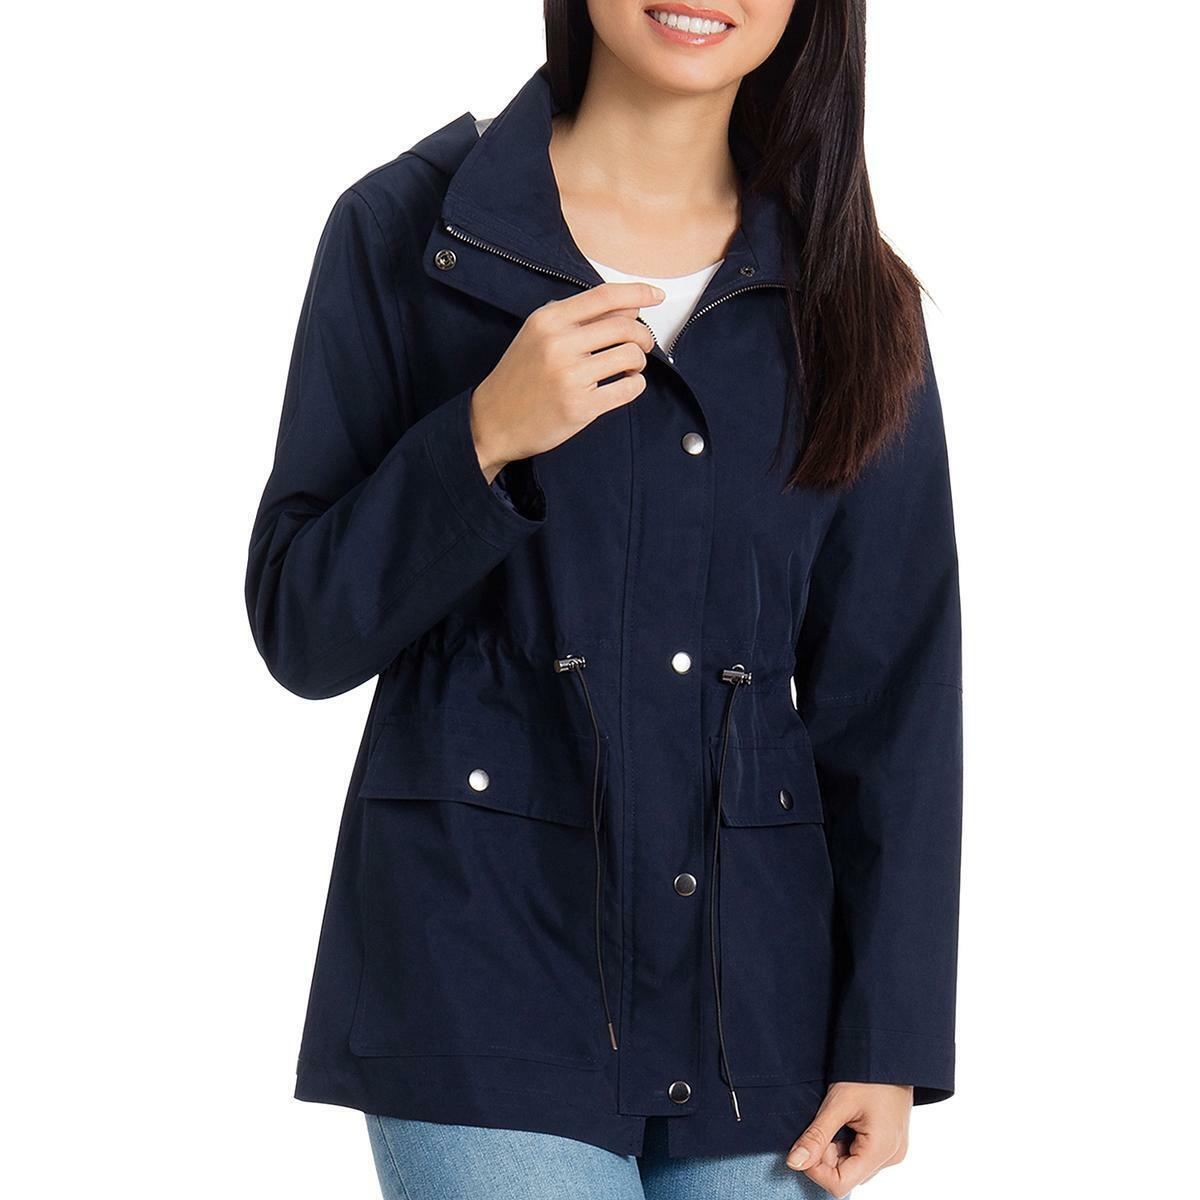 Bagatelle Womens Navy Lightweight Raincoat Anorak Jacket Coat S BHFO 4116